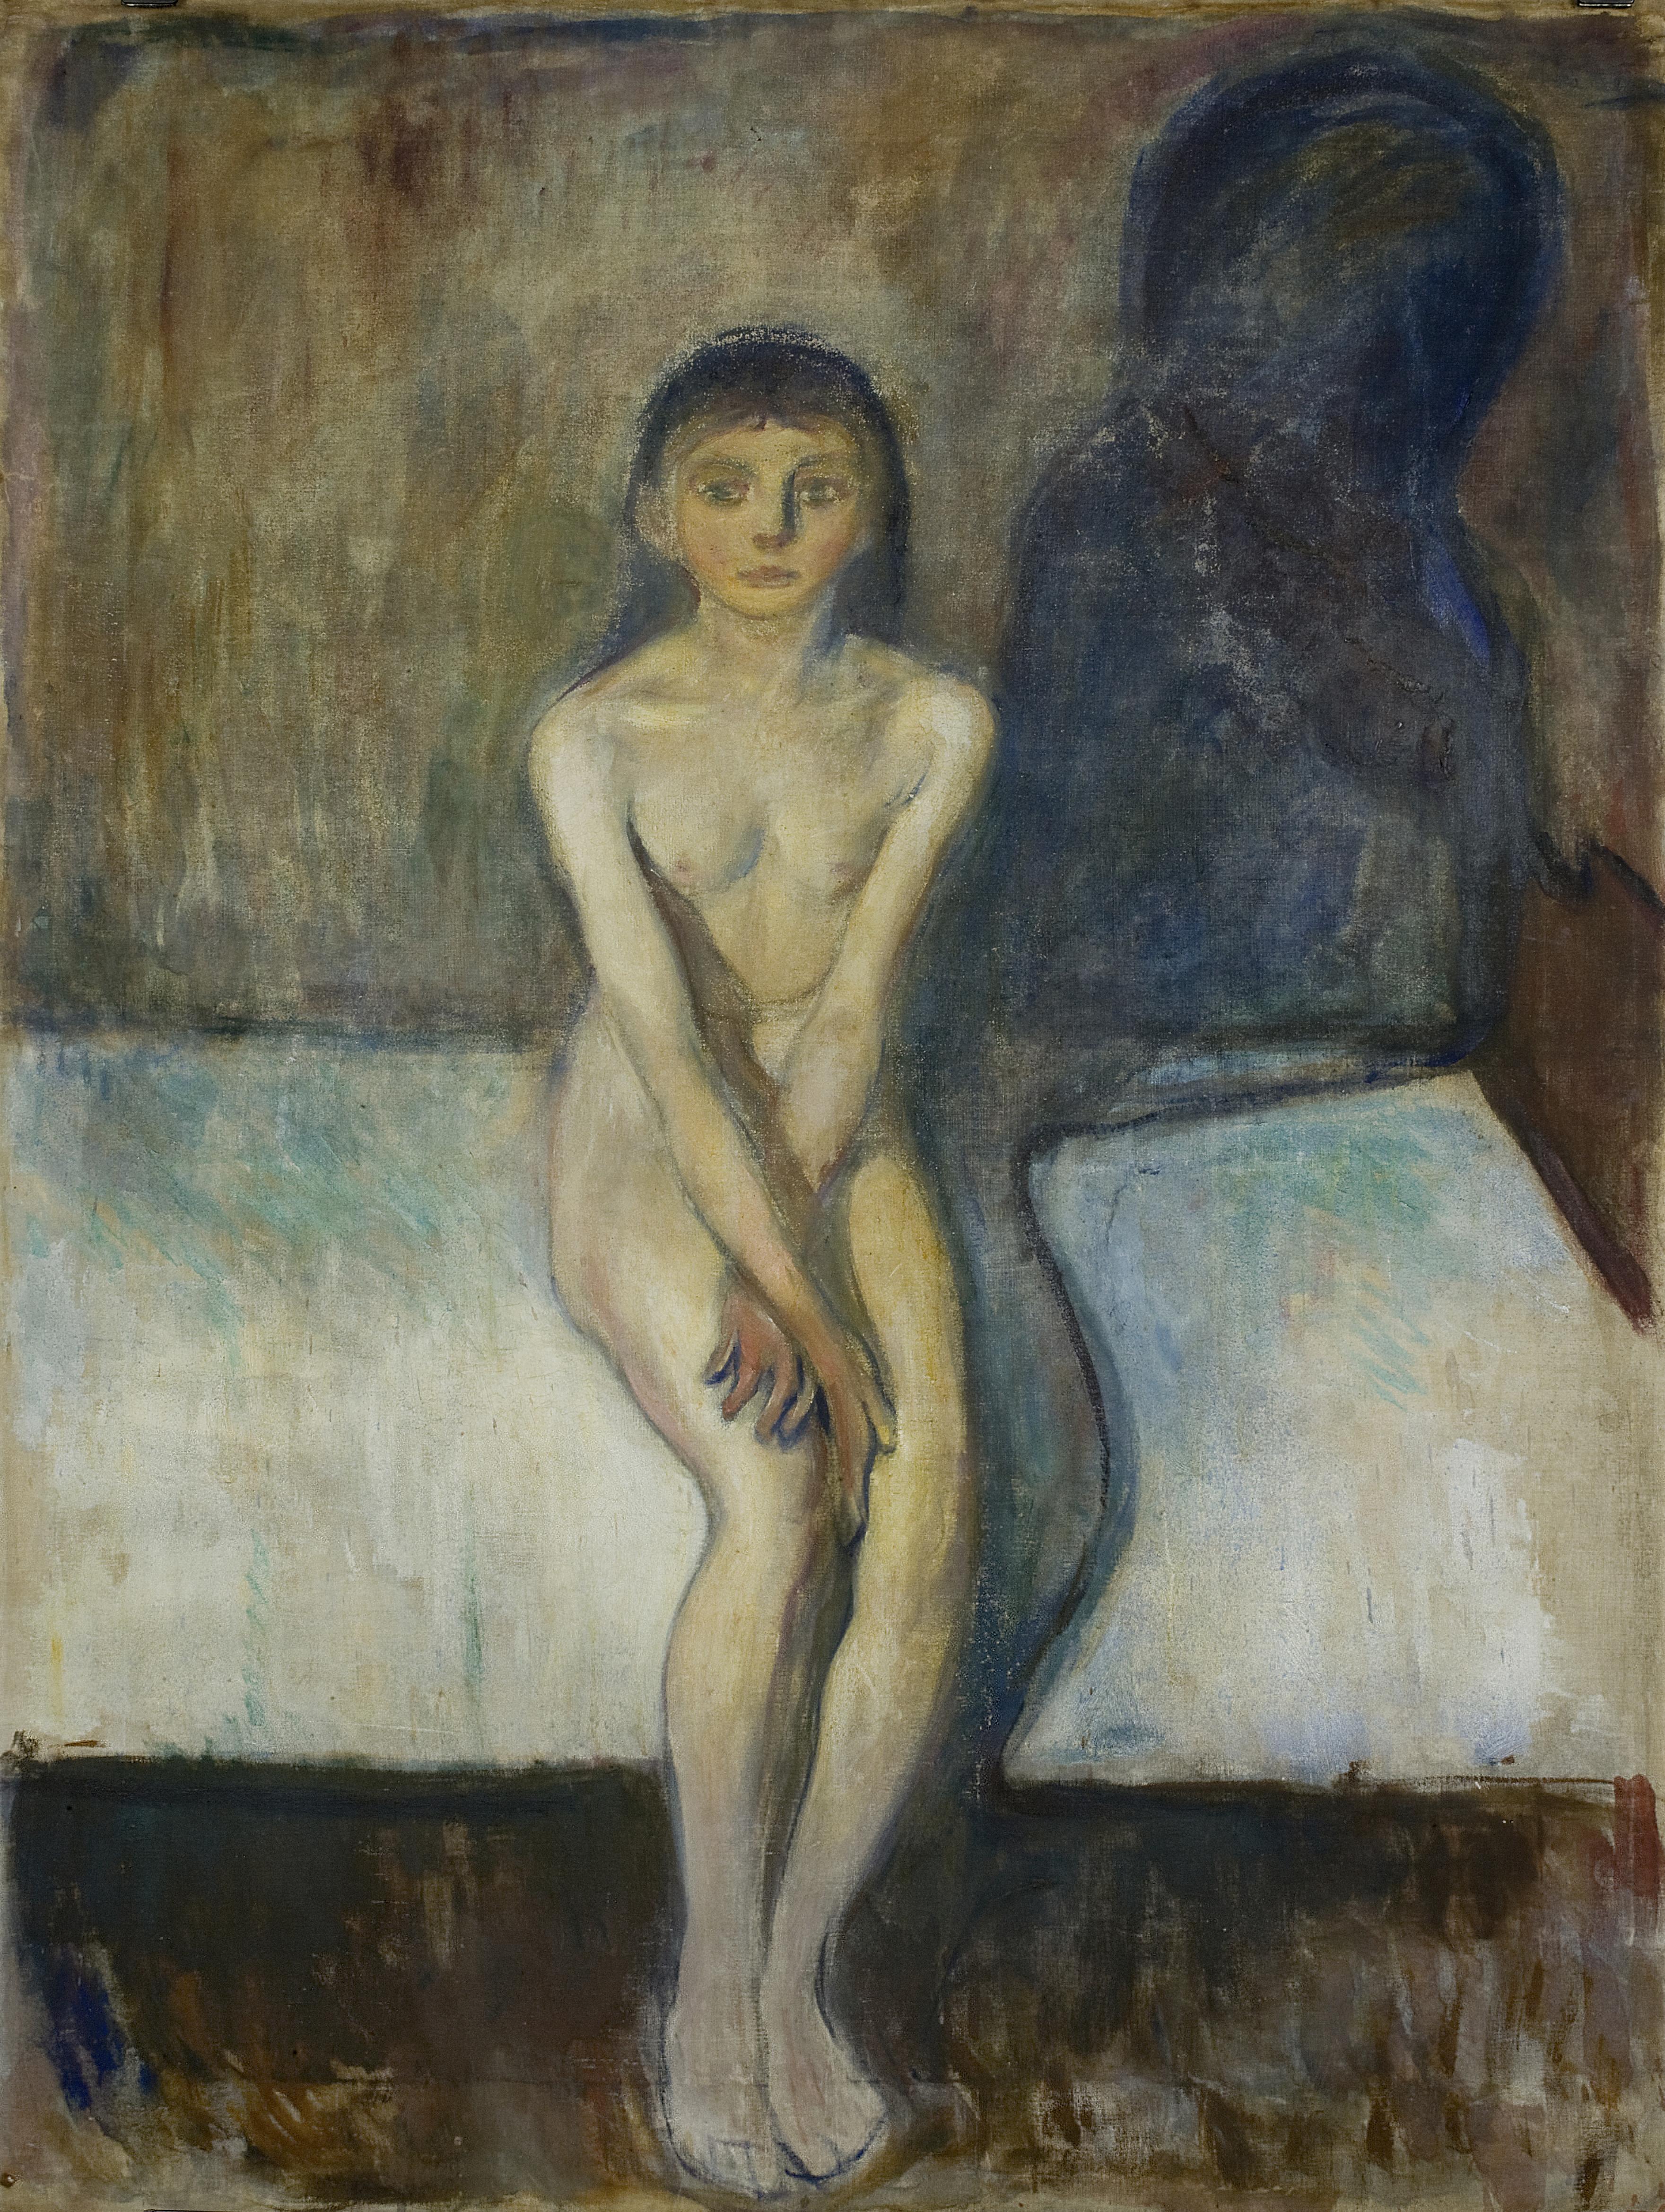 """Puberty"", Edvard Munch (1894)"